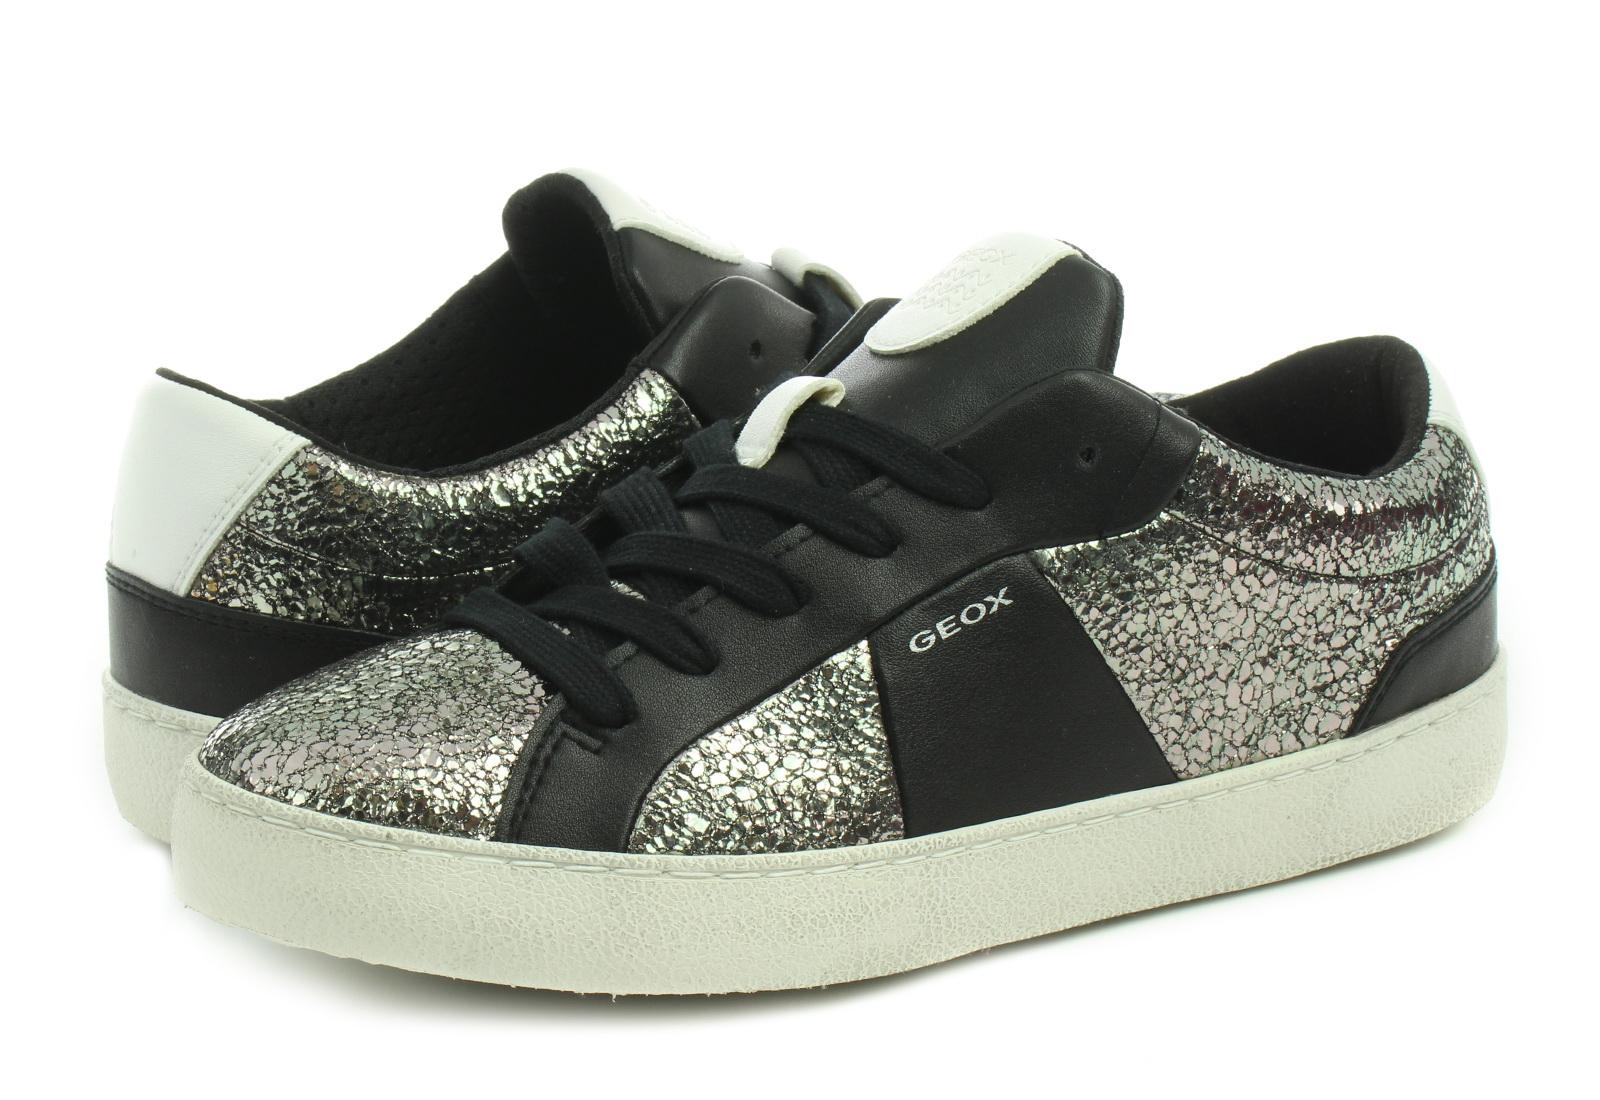 Geox Cipő Warley